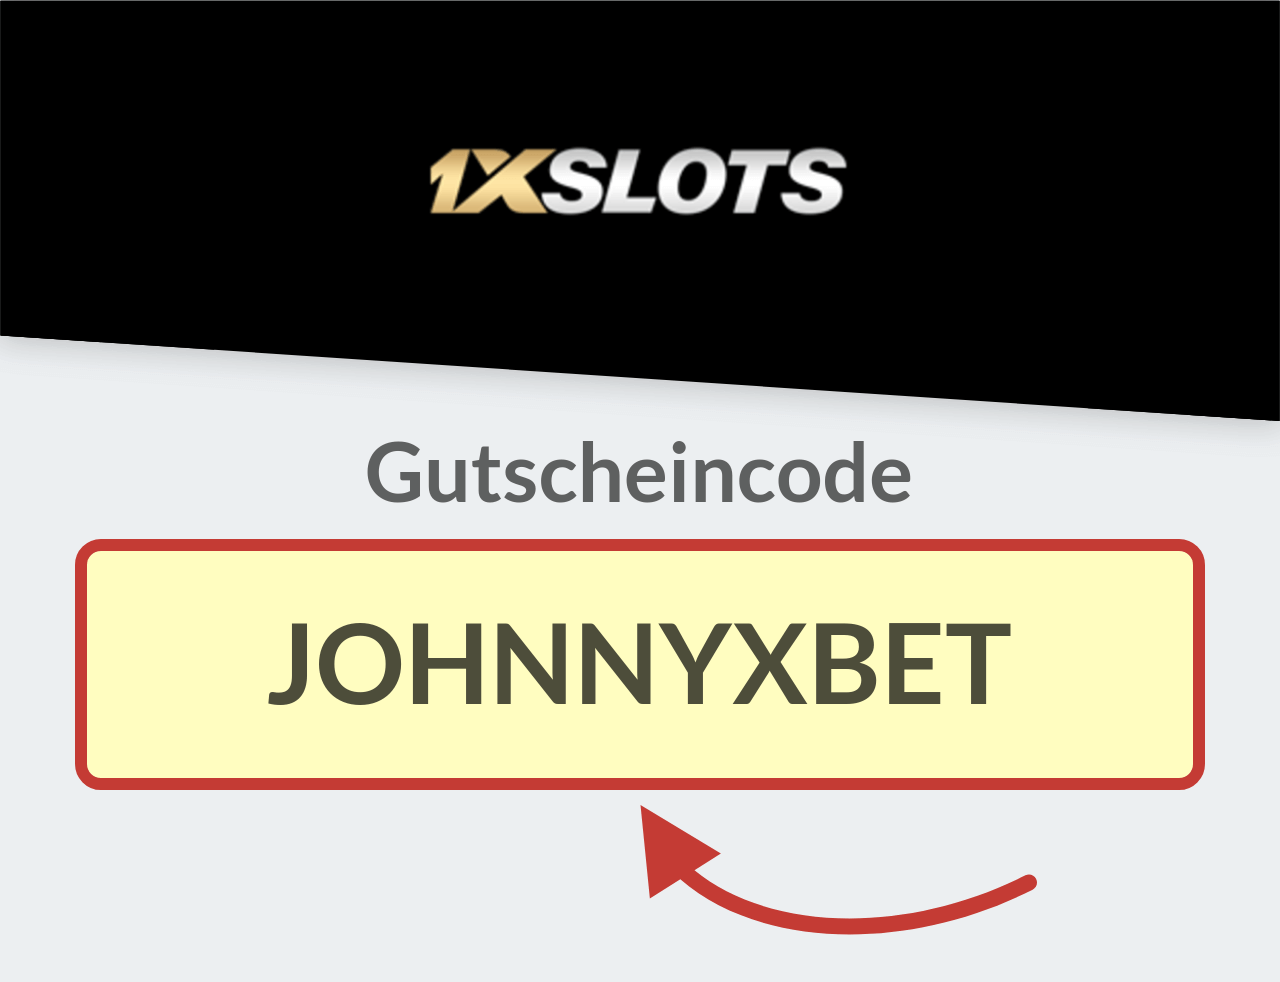 1xSlots Casino Gutscheincode